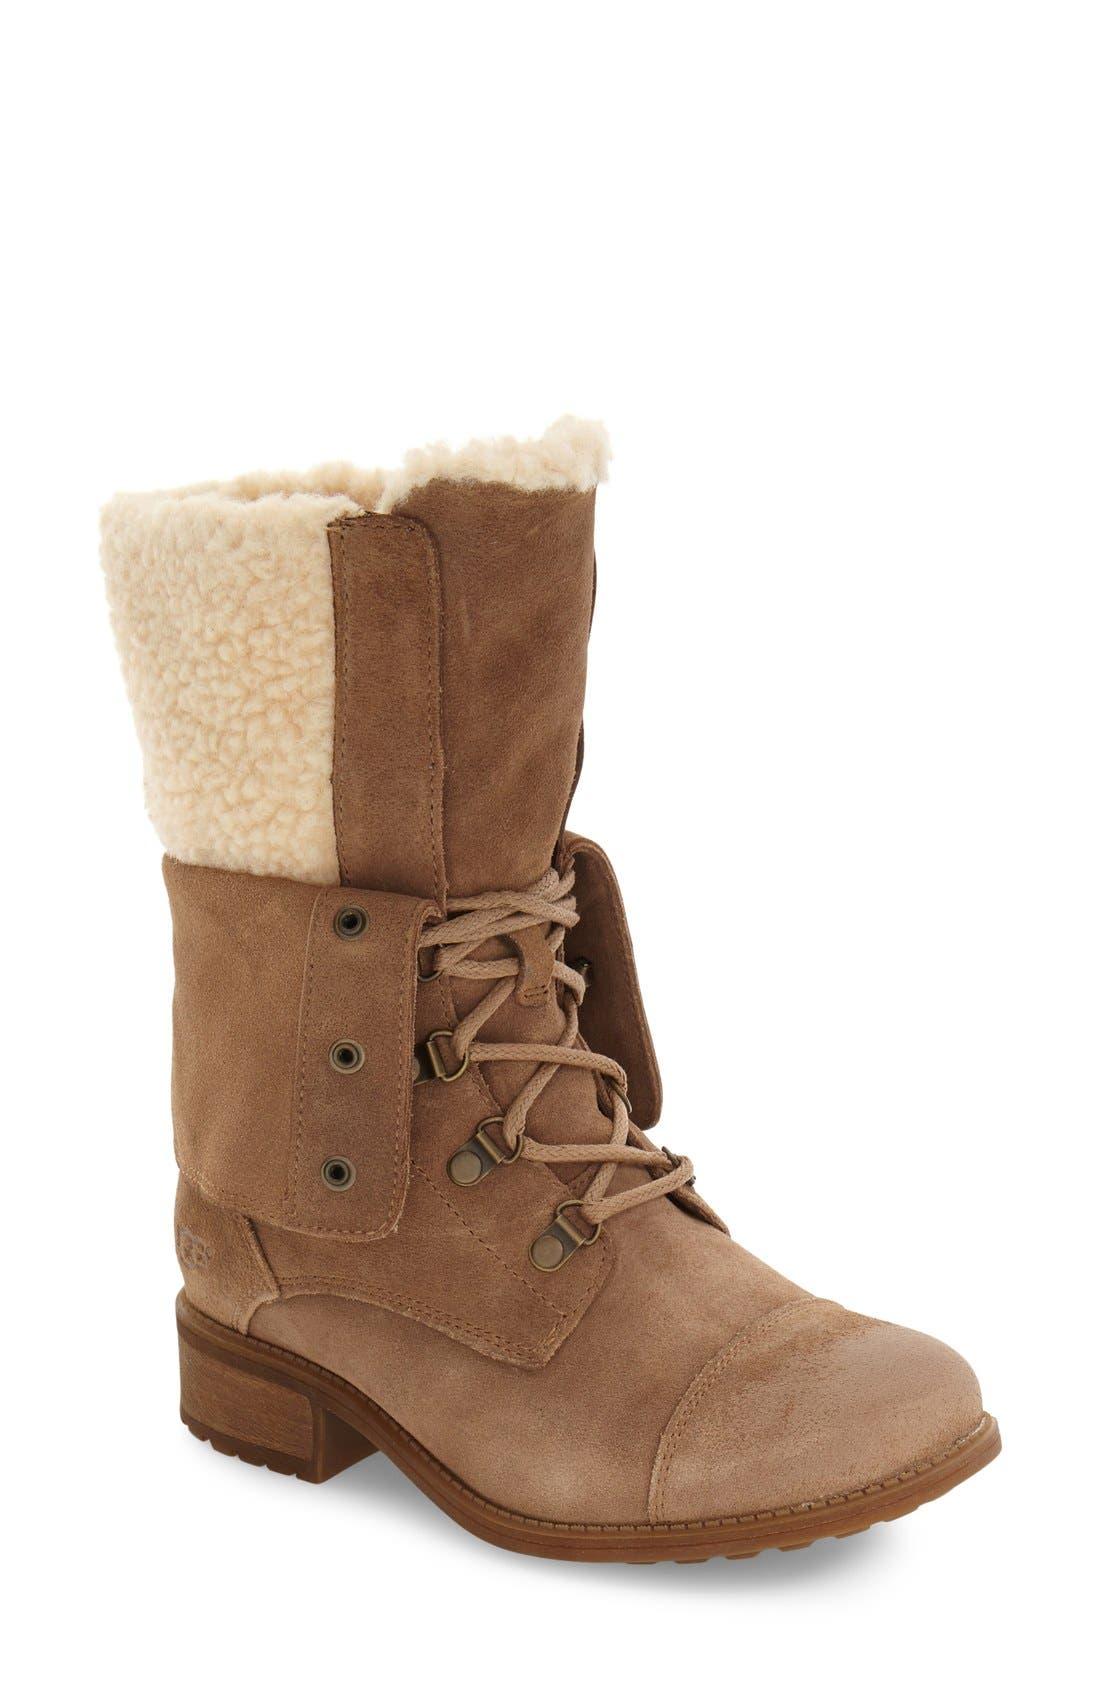 Alternate Image 1 Selected - UGG® Gradin Water Resistant Boot (Women)